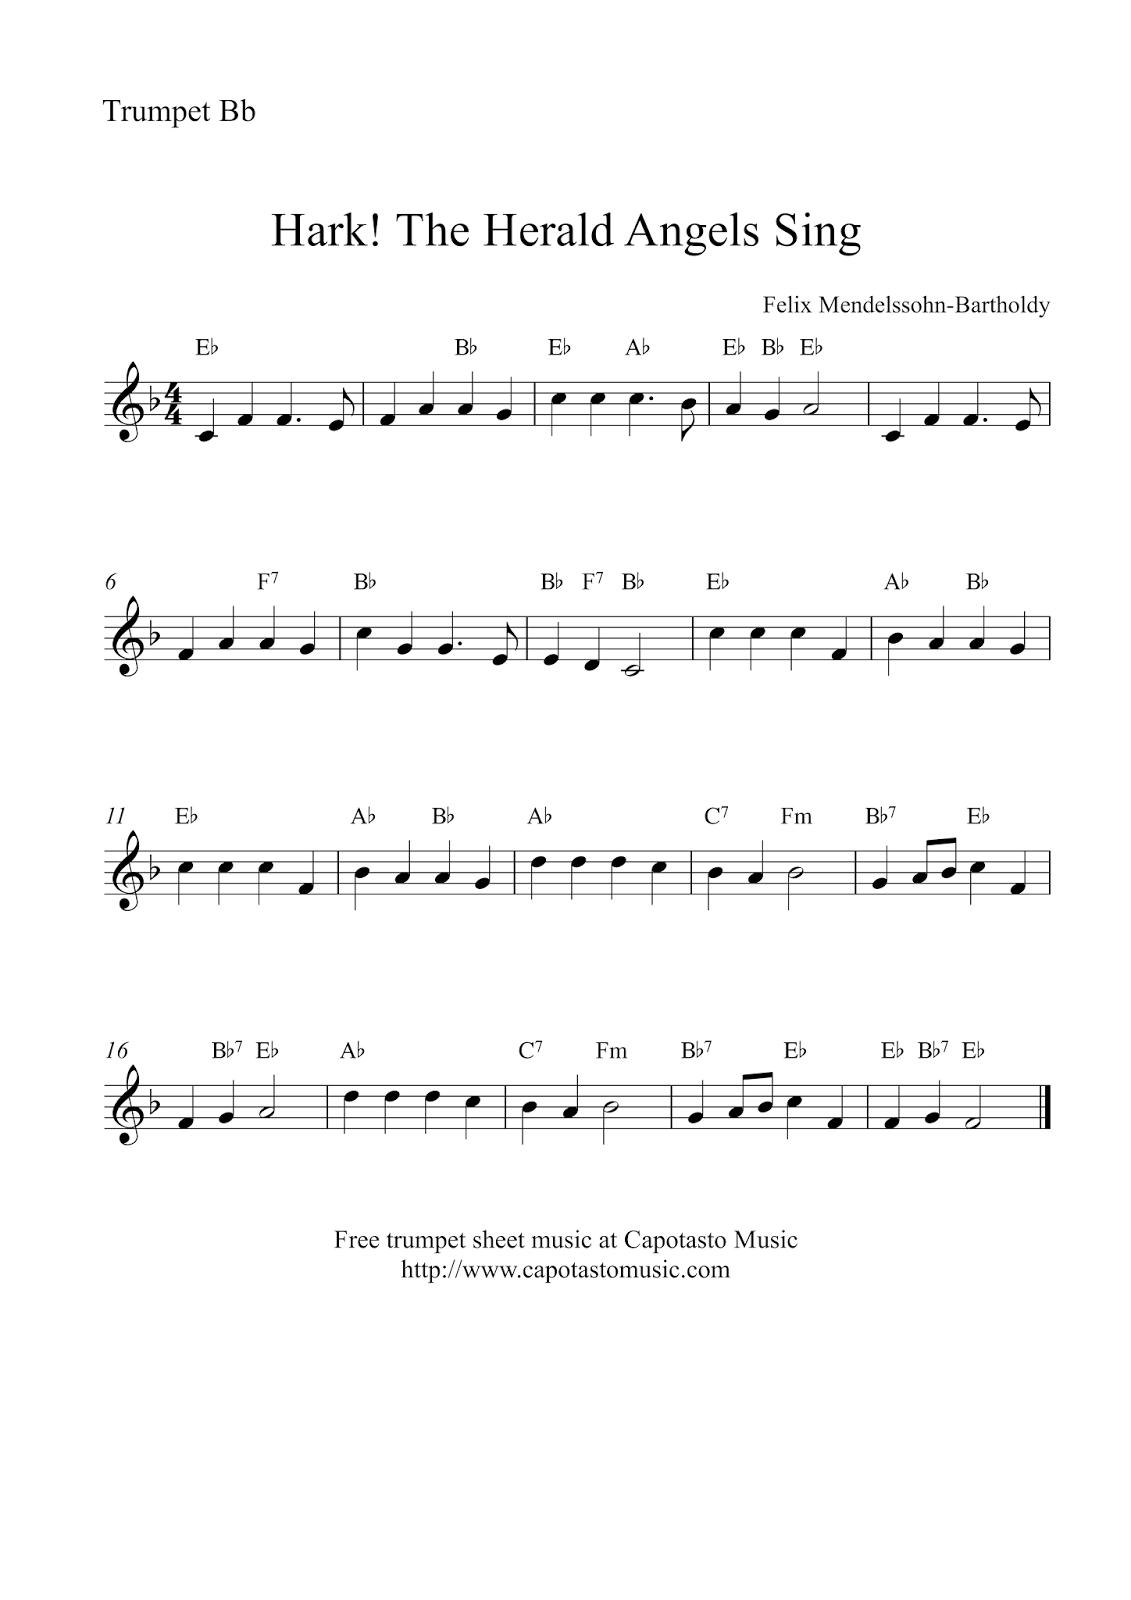 hark the herald angels sing free christmas trumpet sheet music